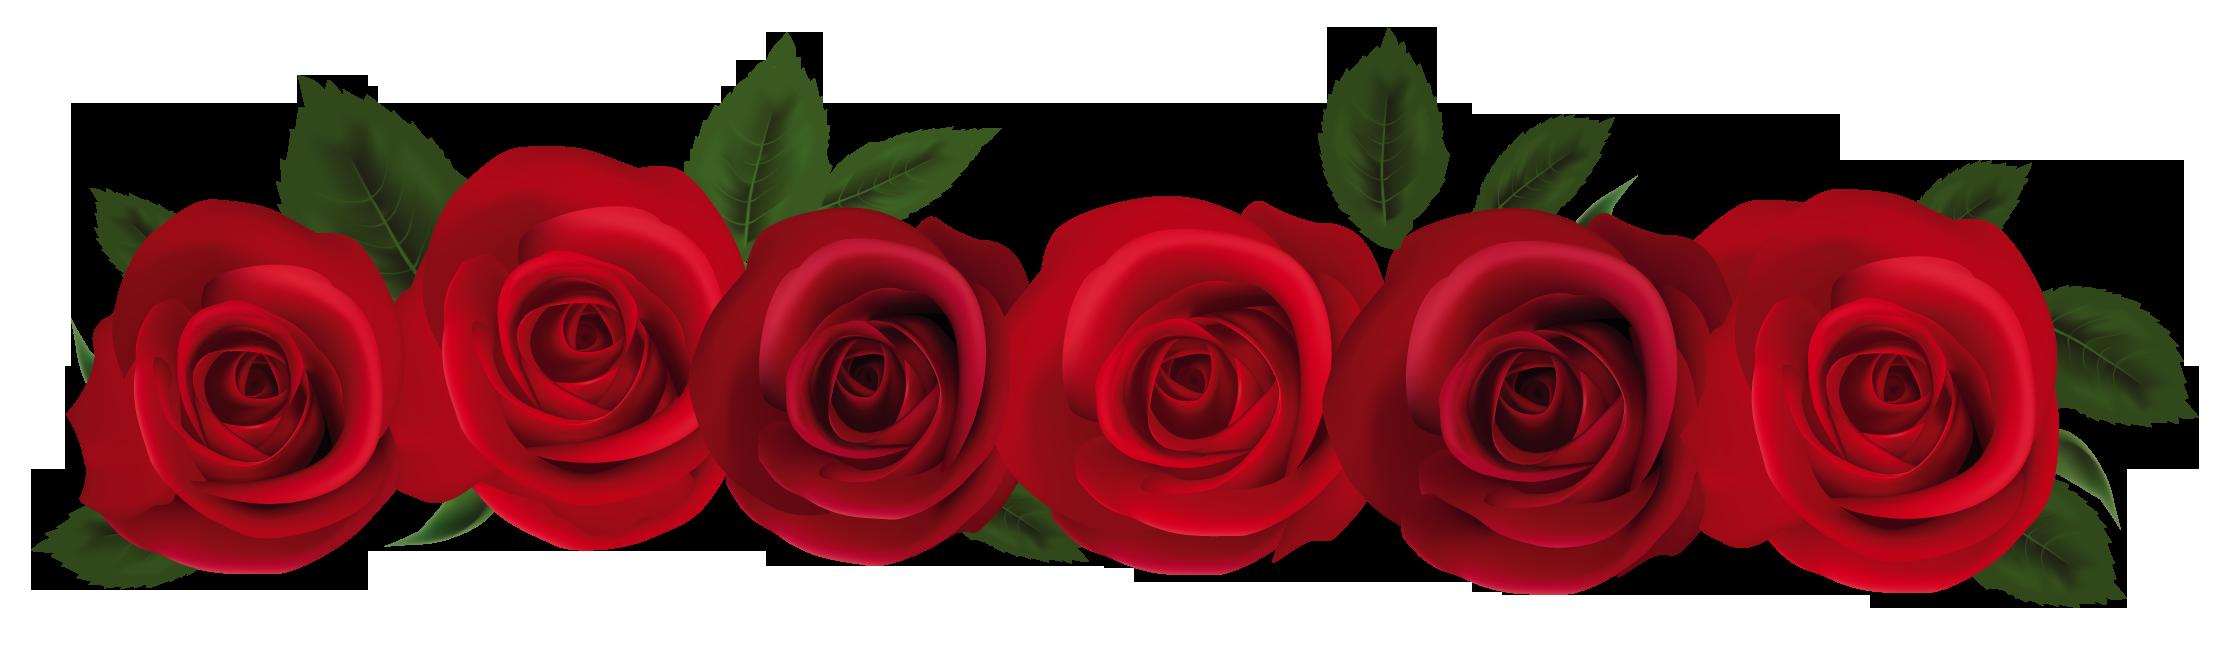 2219x649 rose border clip art